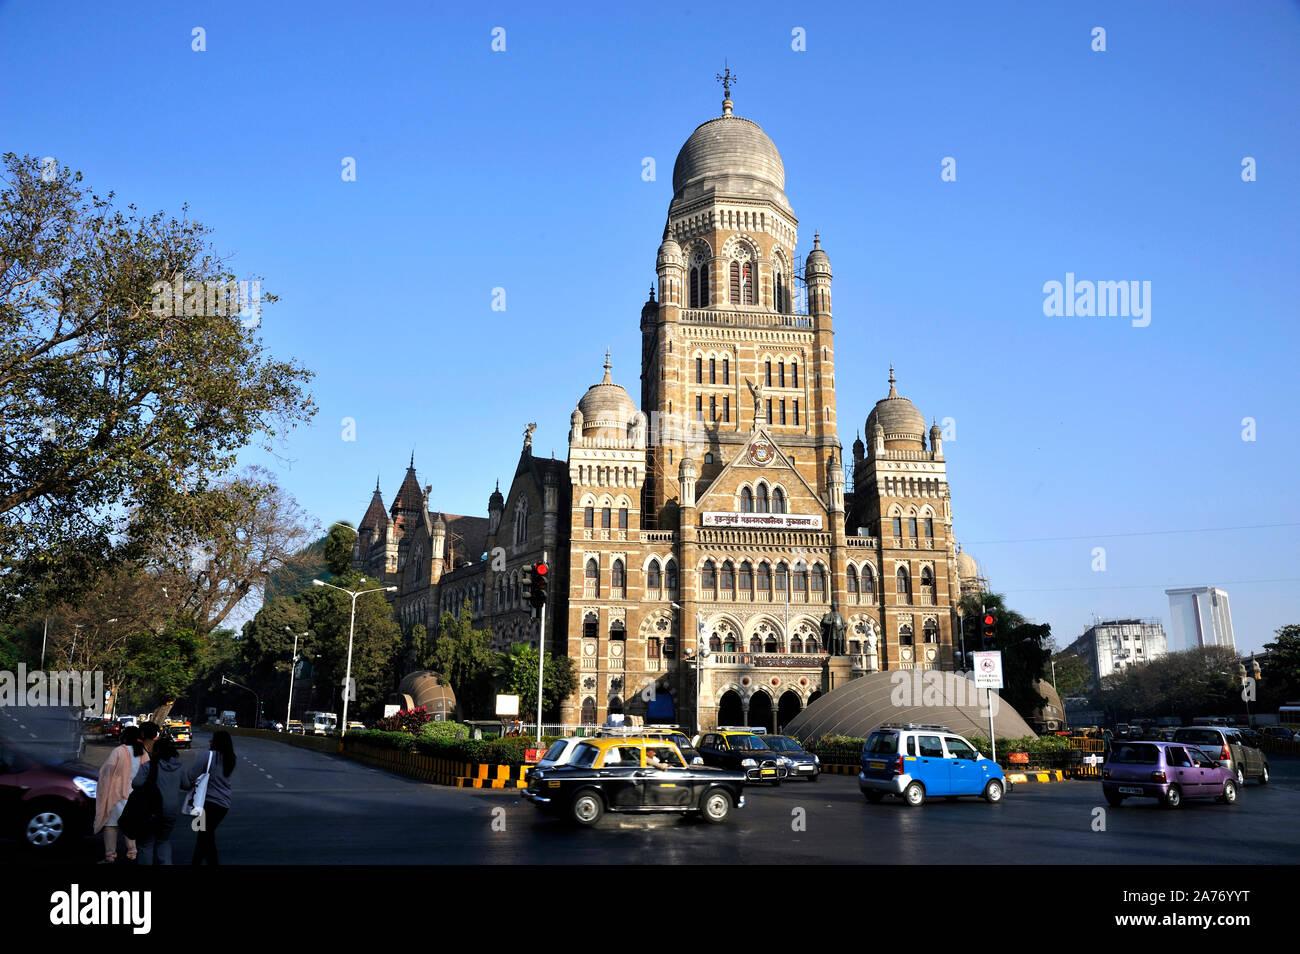 Mumbai; Maharashtra; India, Southeast Asia - 14; 2012 : Brihanmumbai Municipal Corporation(BMC) Headquarter Near Chatrapati Shivaji Terminal (C.S.T) Stock Photo